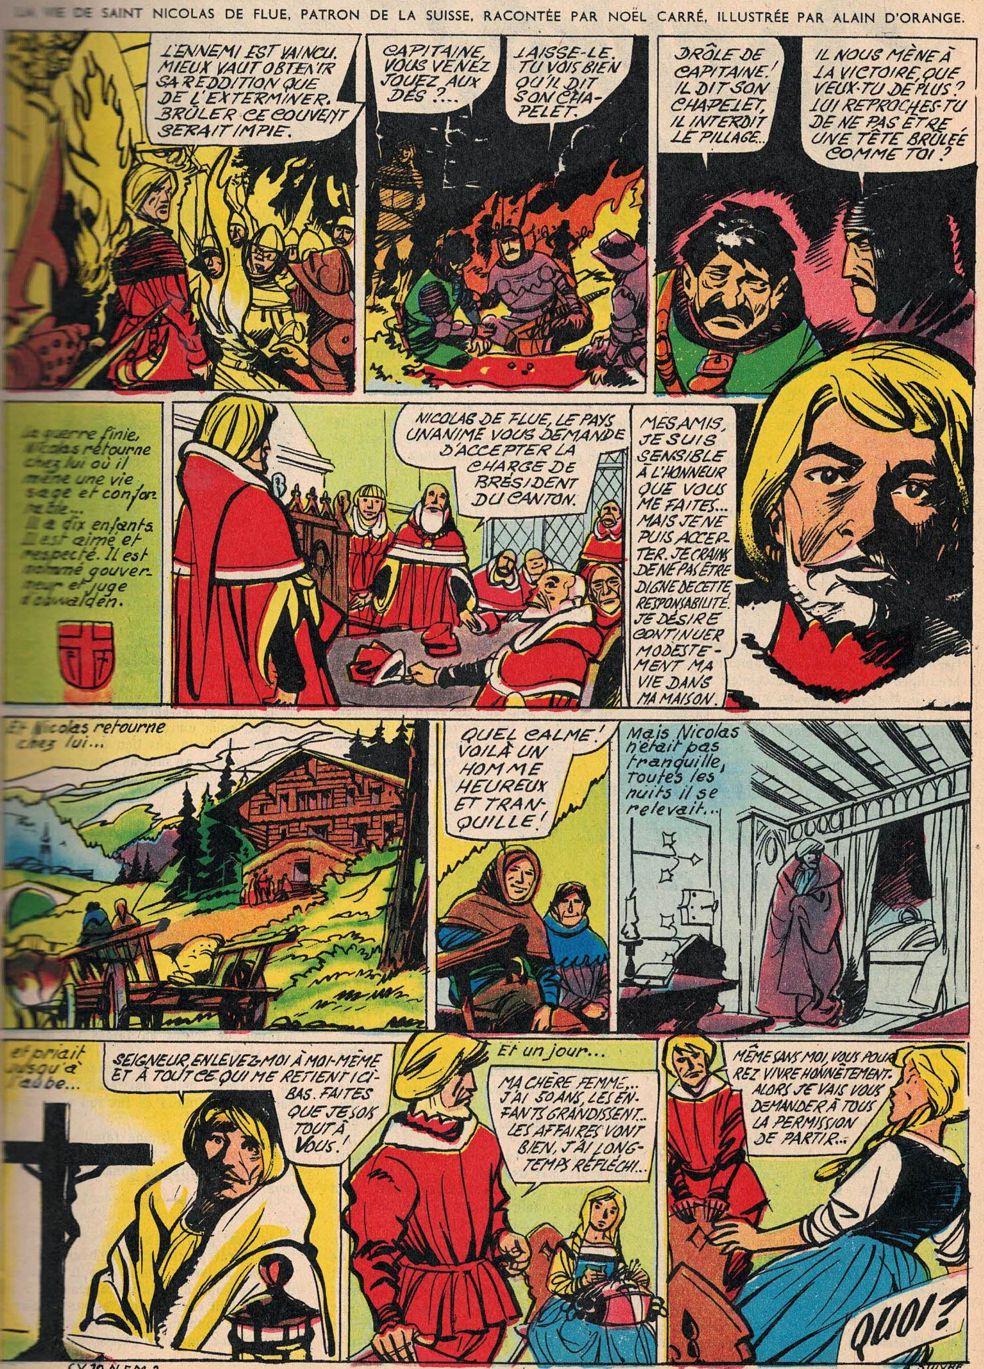 Alain d'Orange - Page 5 Deflue11